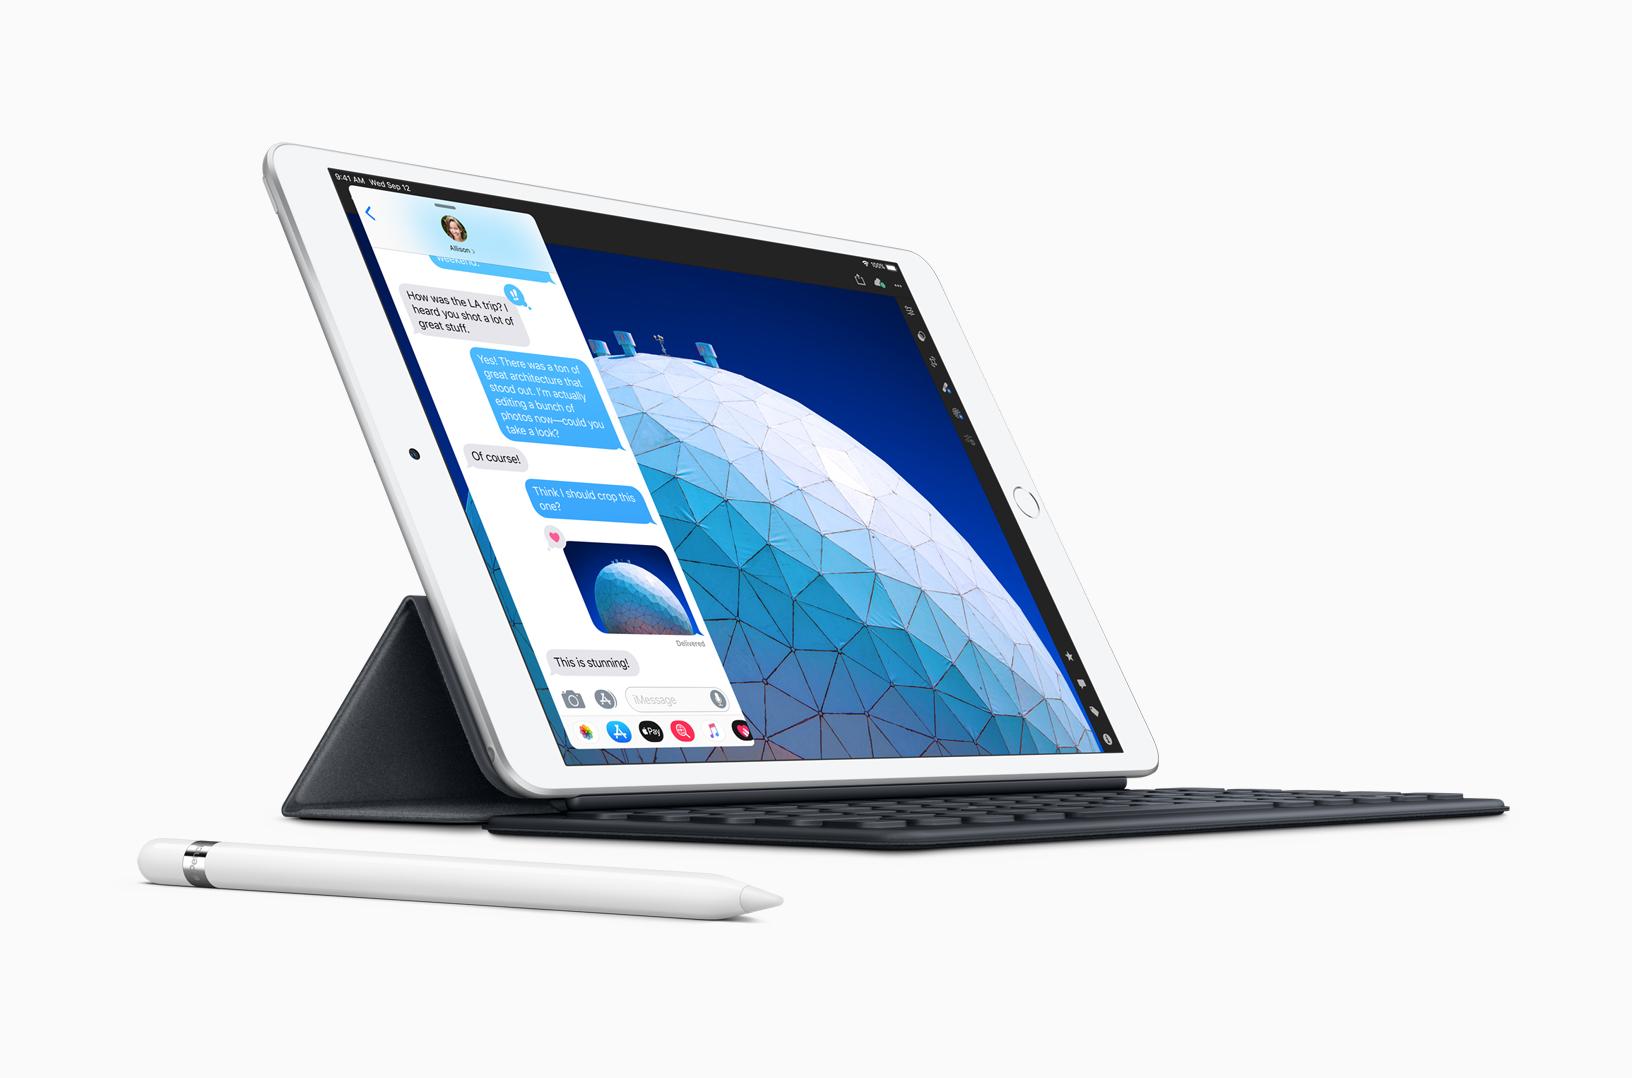 Apple iPad Air - Space Gray (Early 2019) — $449